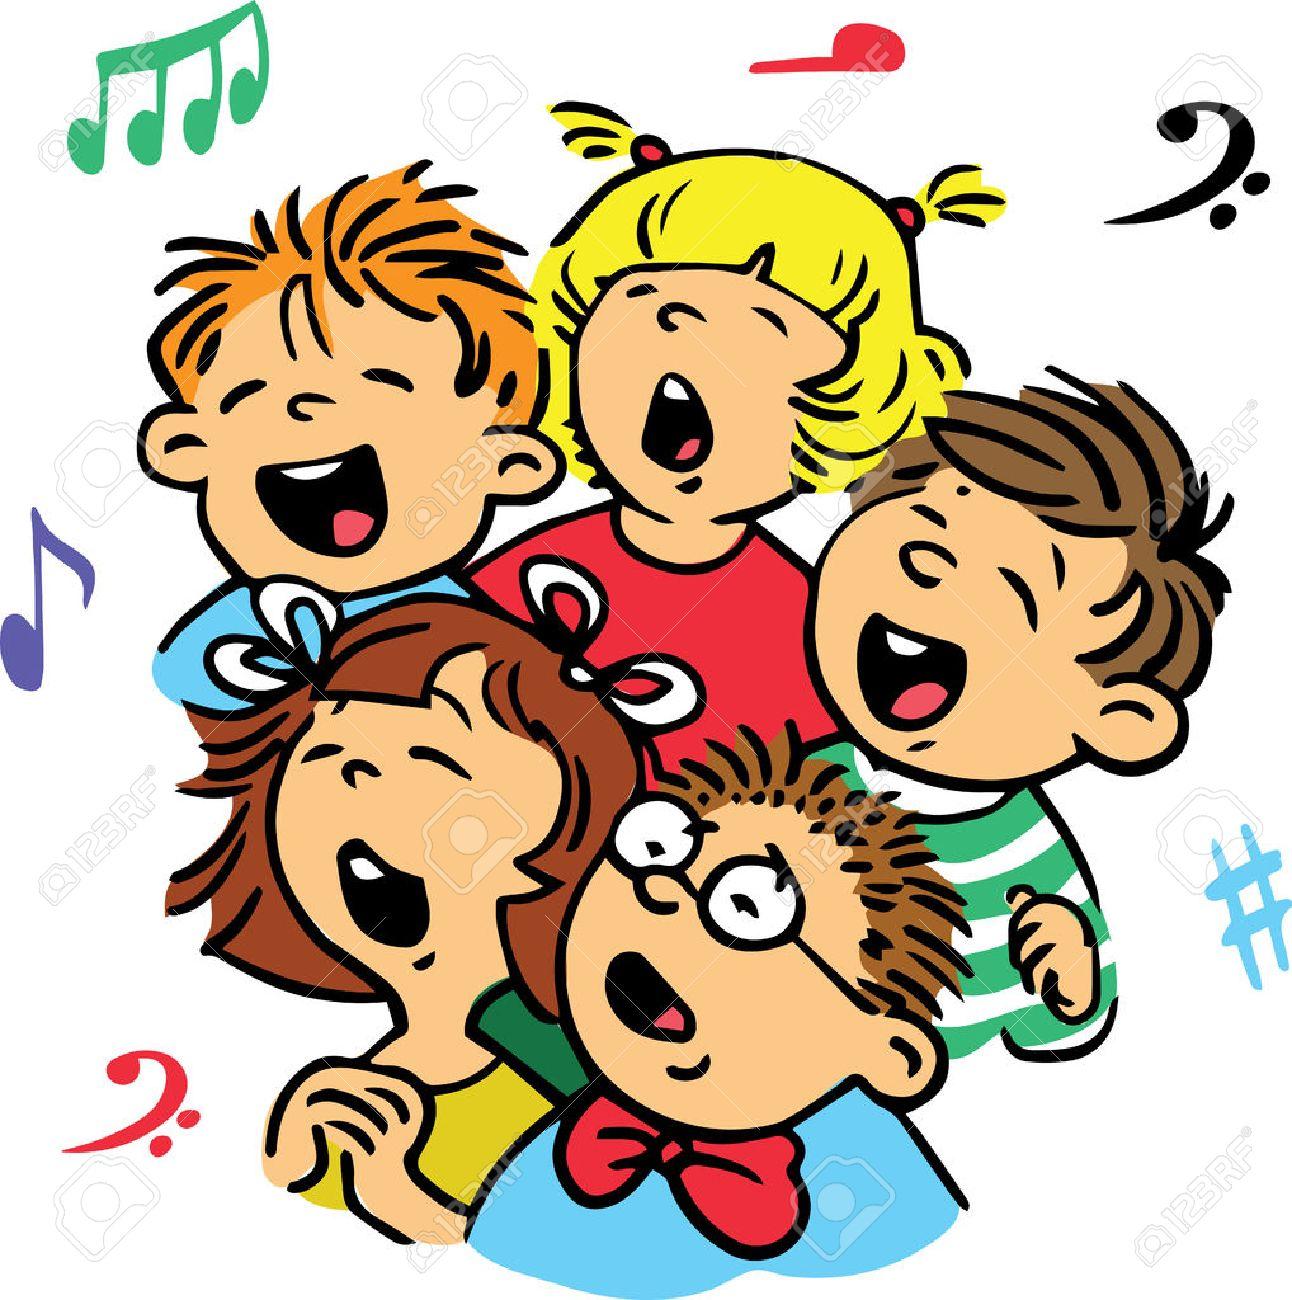 children singing clipart at getdrawings com free for personal use rh getdrawings com Gospel Singing Clip Art Drum Clip Art